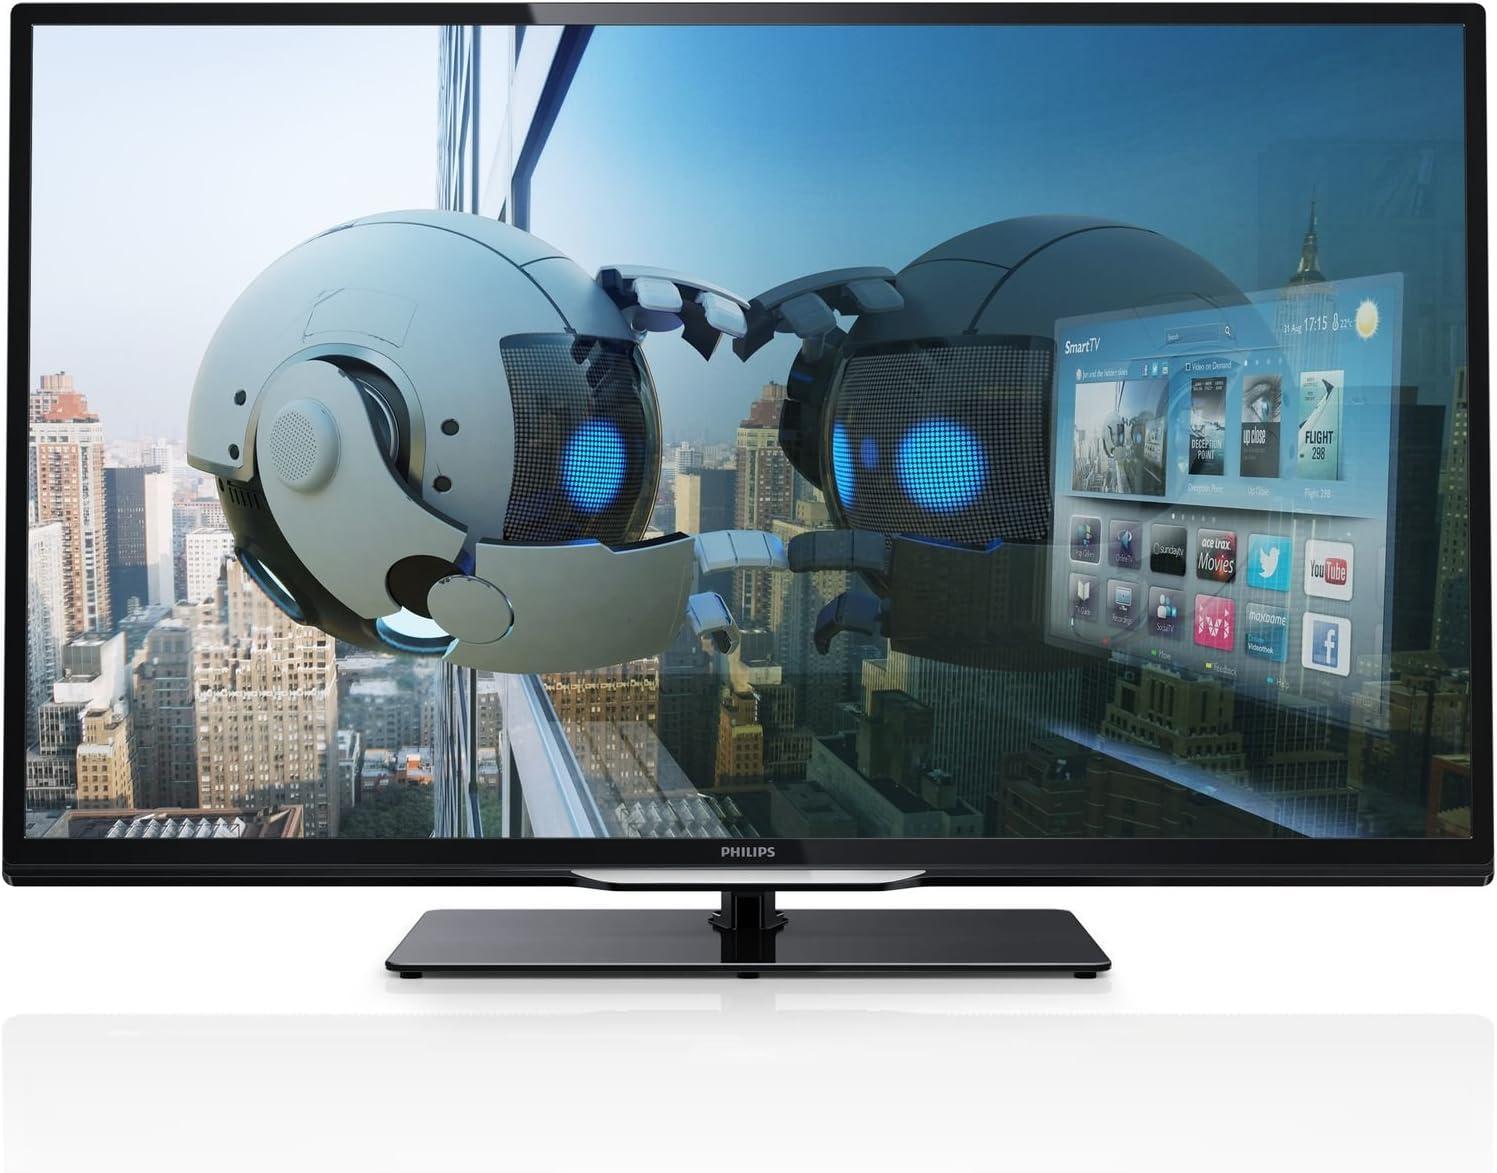 Philips 46PFL4208H/12 - Televisor LED de 46 pulgadas, Full HD, 200 Hz: Amazon.es: Electrónica